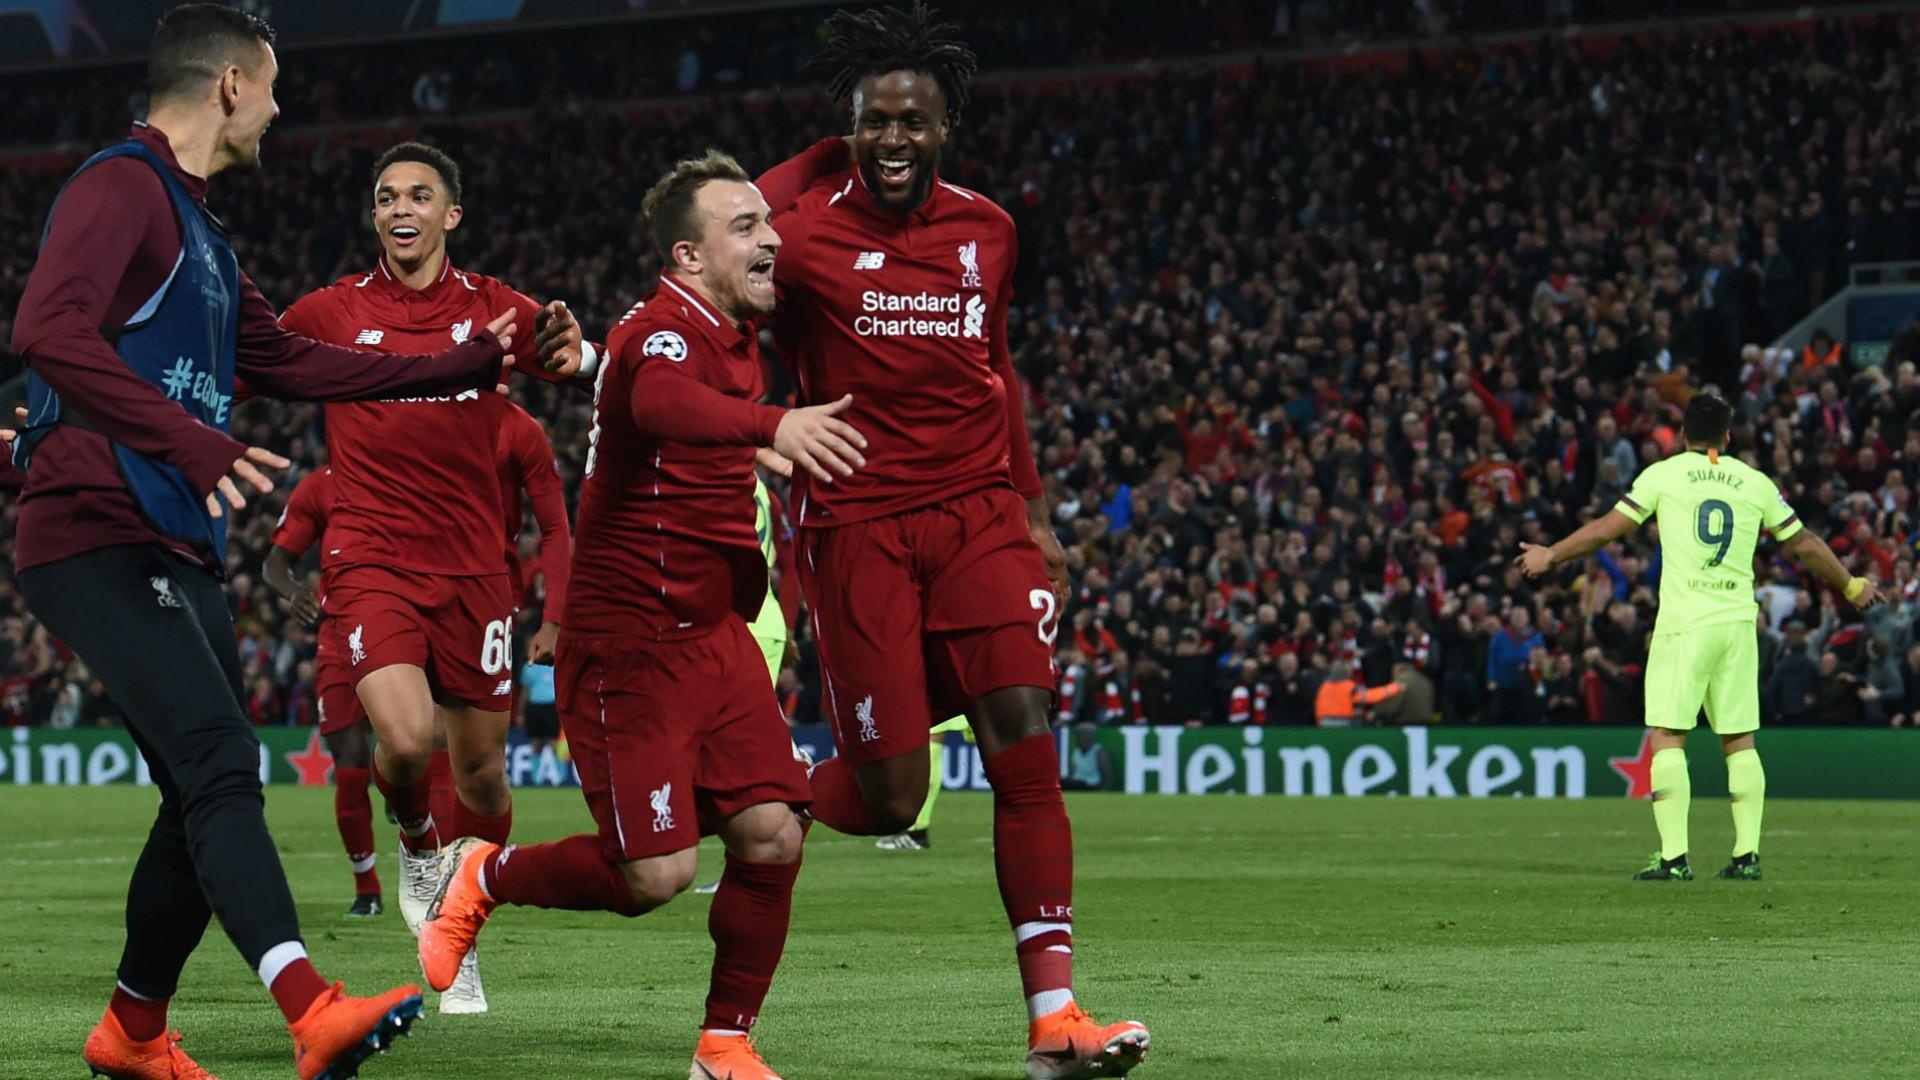 Xherdan Shaqiri Divock Origi Und Co Diese Spieler Sollen Den Fc Liverpool Wohl Verlassen Goal Com